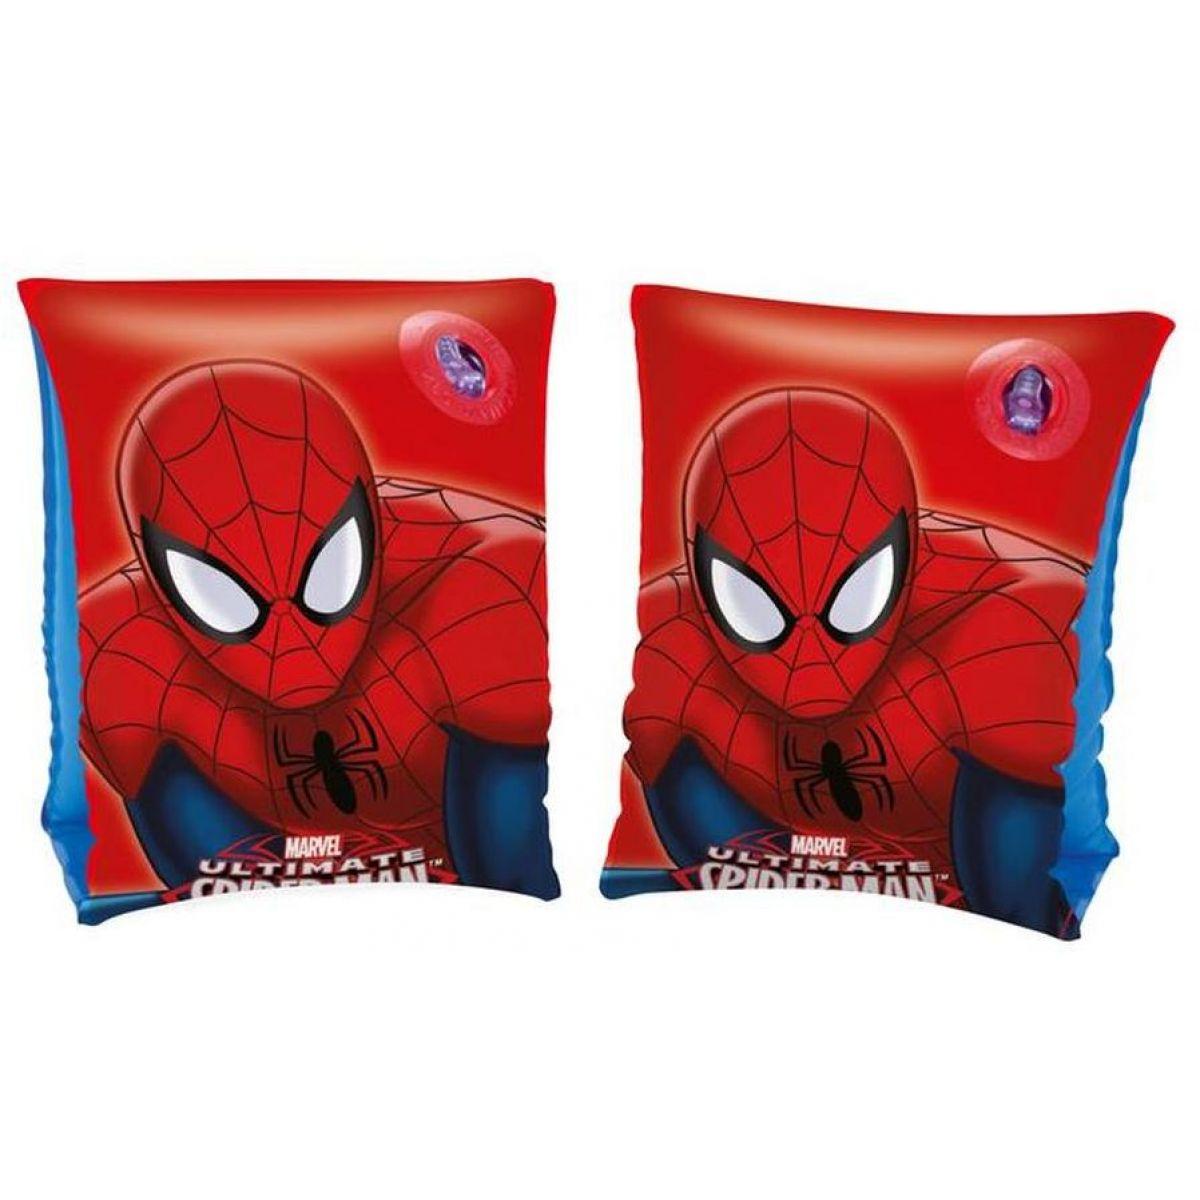 Bestway Nafukovacie rukávky Spiderman 23 x 15 cm